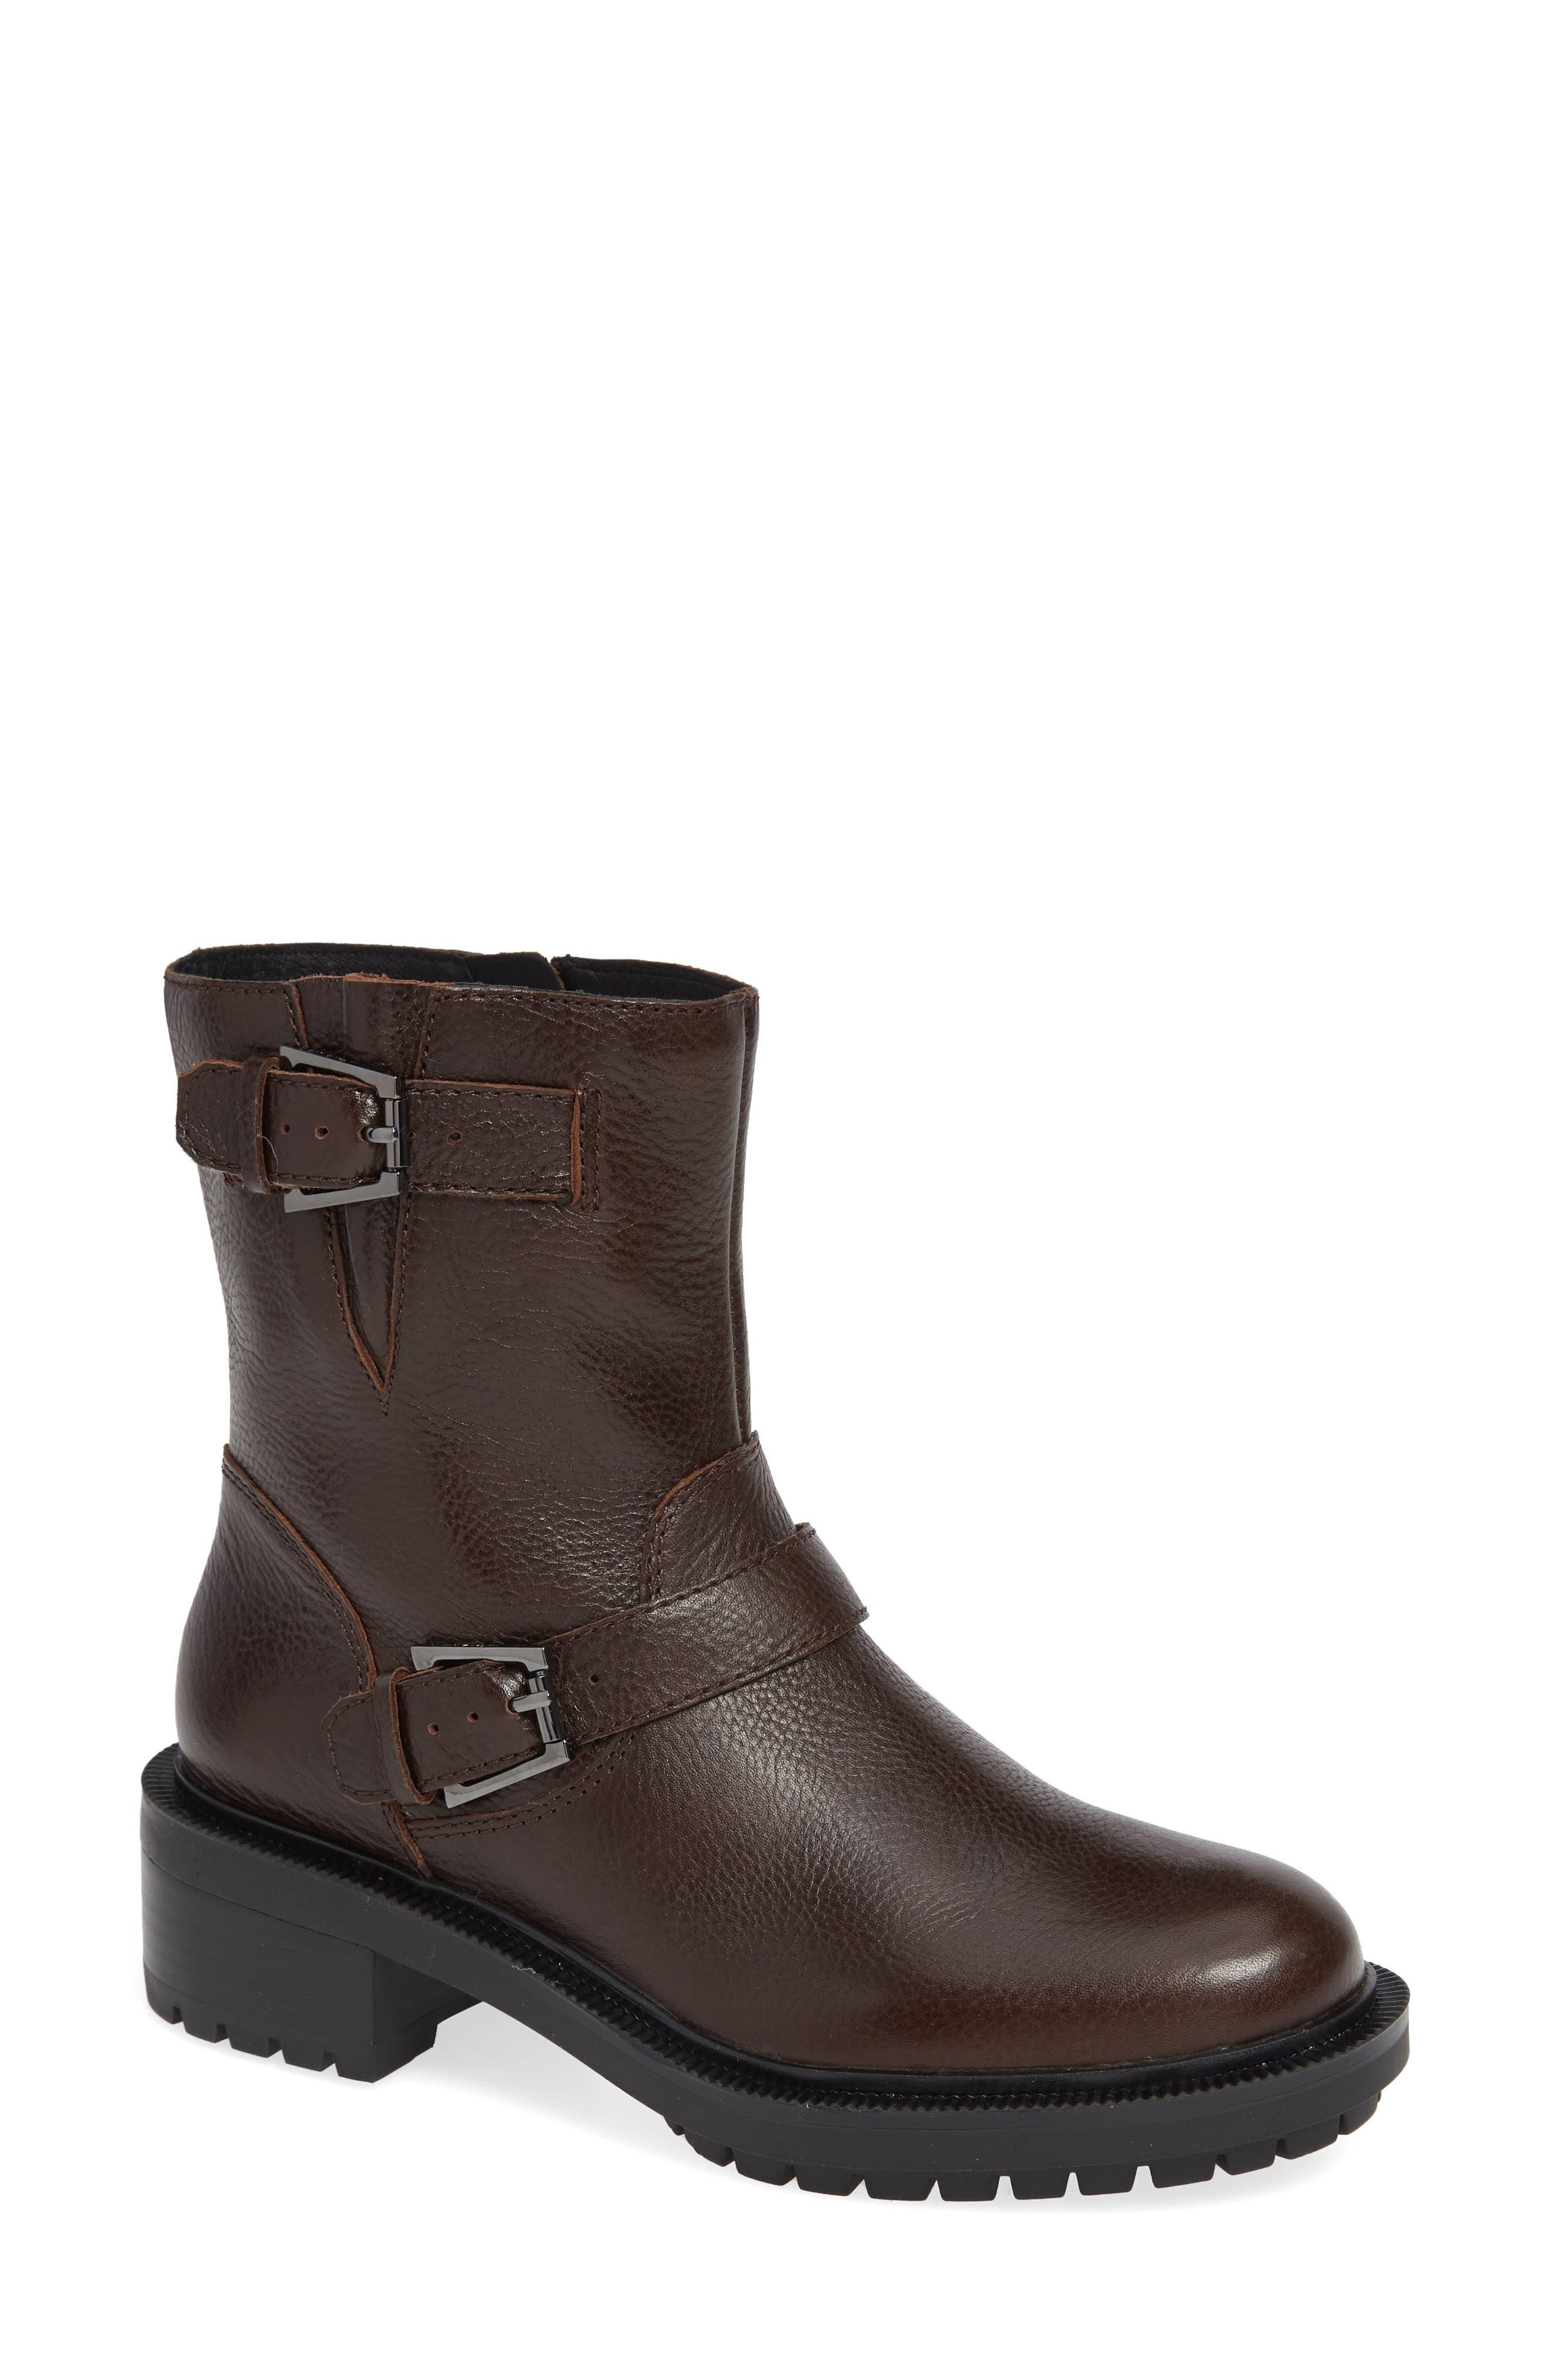 Botkier Marlow Boot- Brown